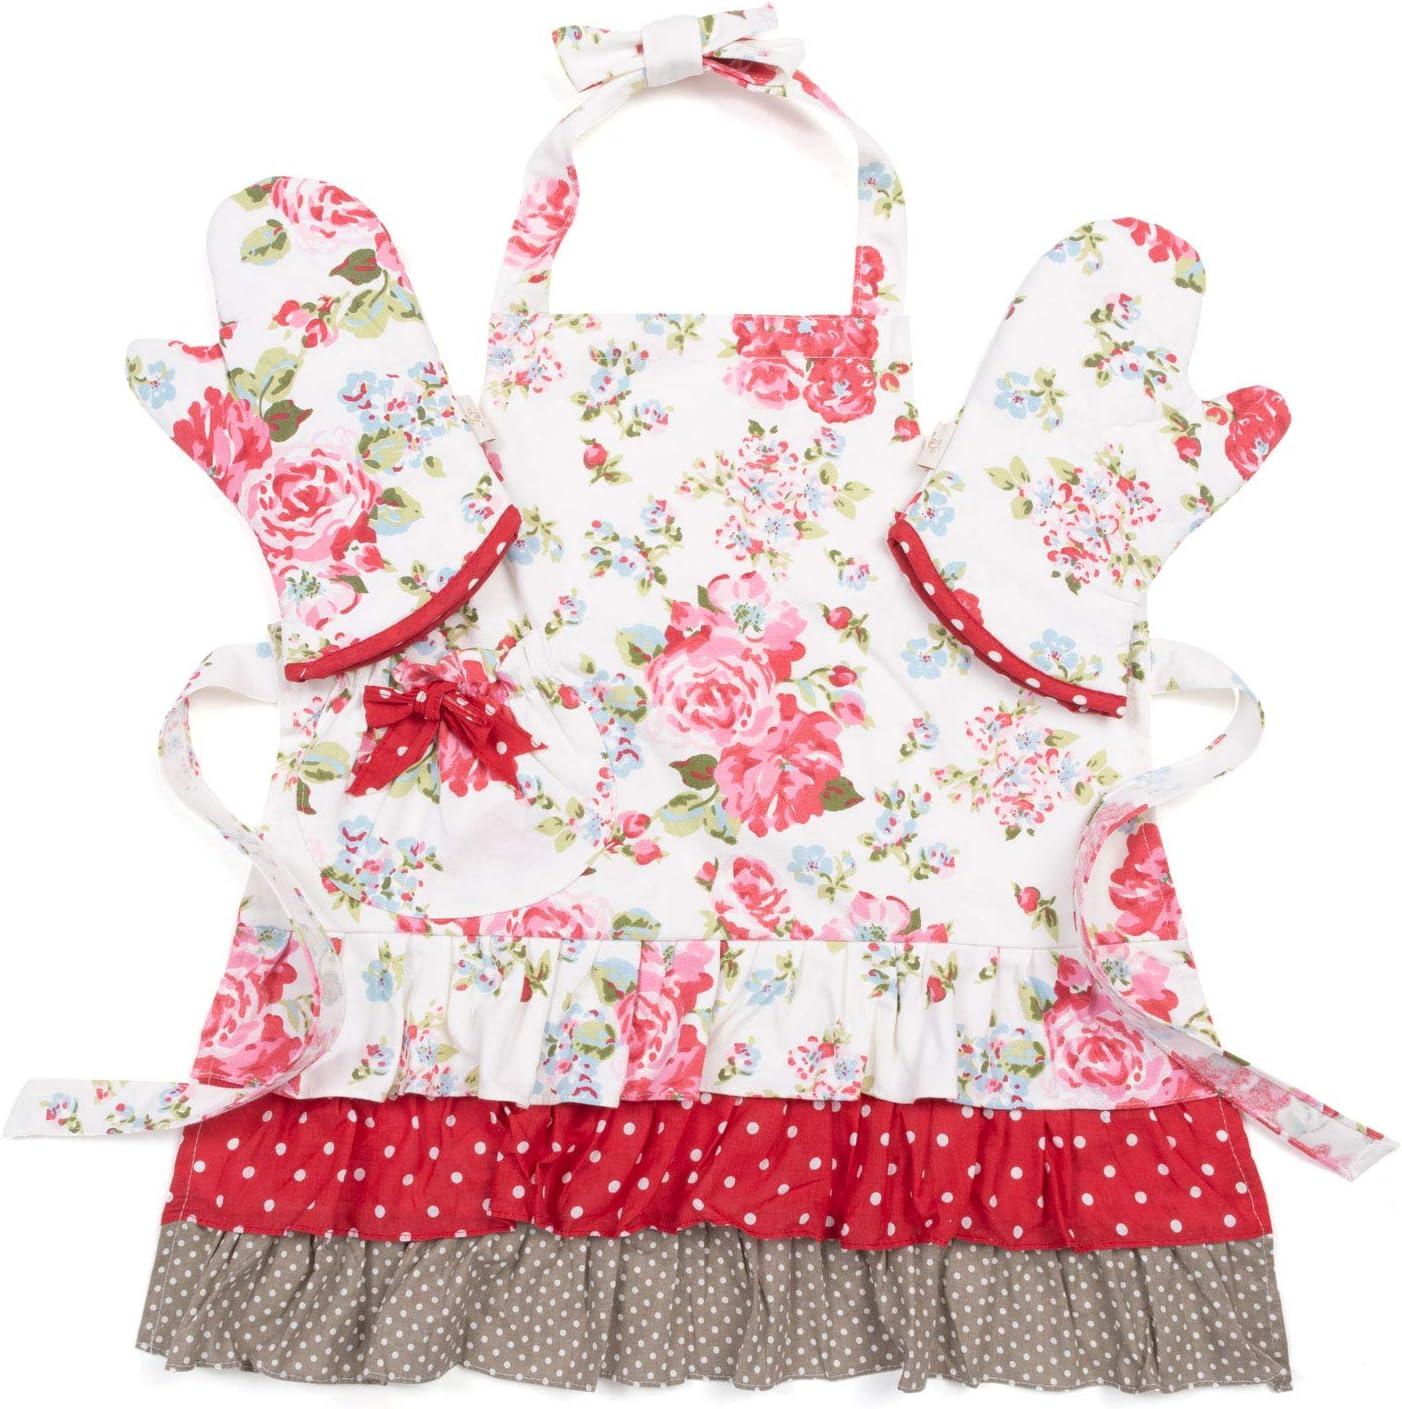 NEOVIVA Kids Apron and Child Oven Mitts Set for Pretend Kitchen, Floral Toddler Kitchen Linen Set for Girls, Floral Lollipop Red